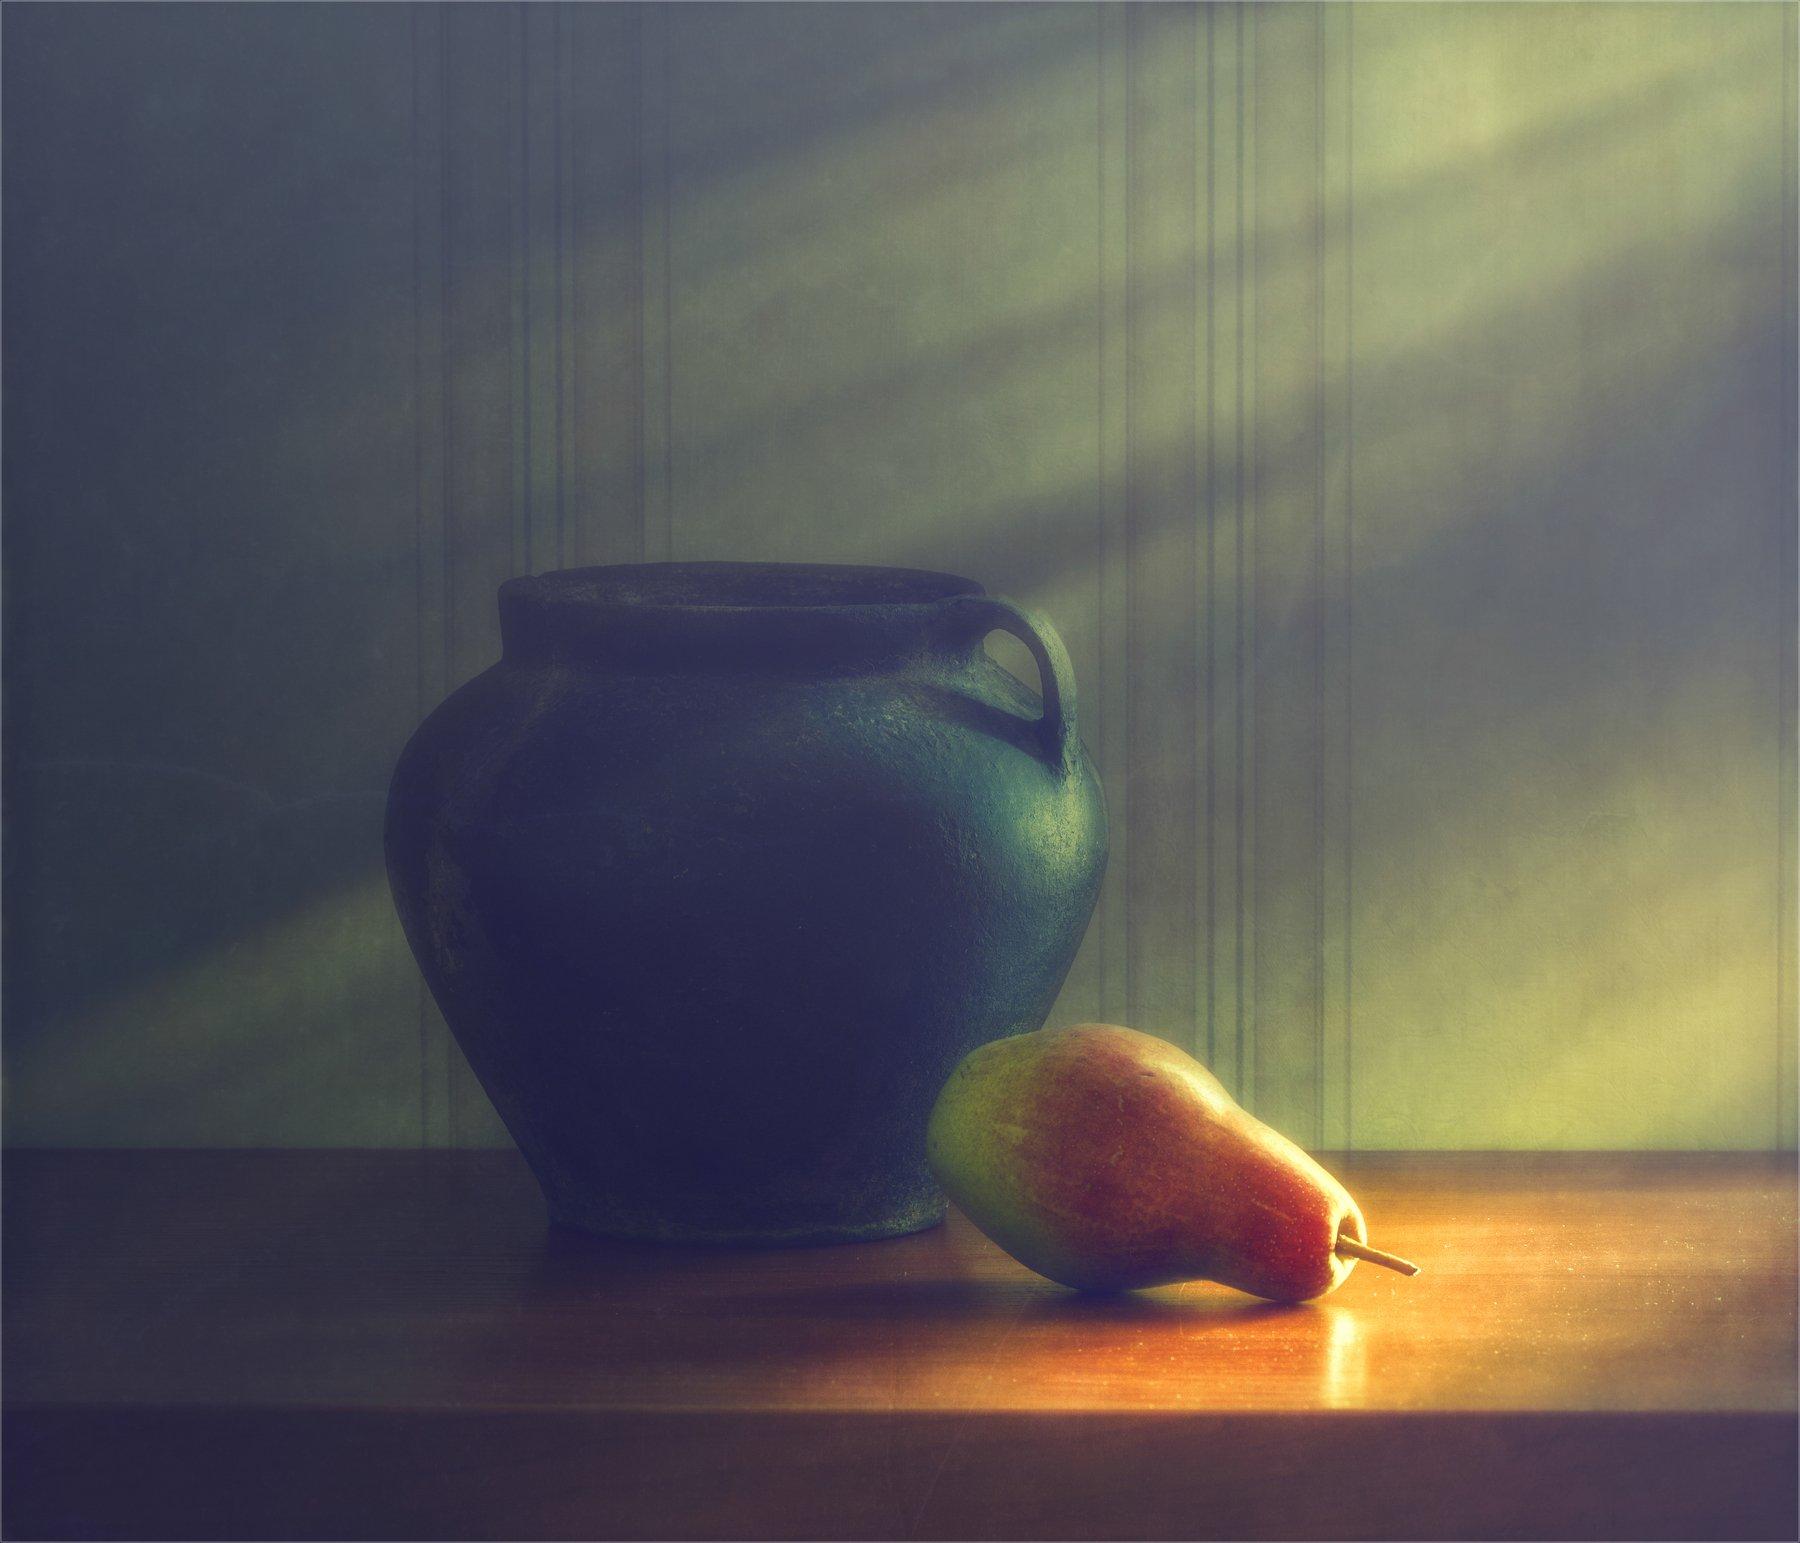 still life, натюрморт,   винтаж, минимализм, груша, горшочек, глечик,, Михаил MSH